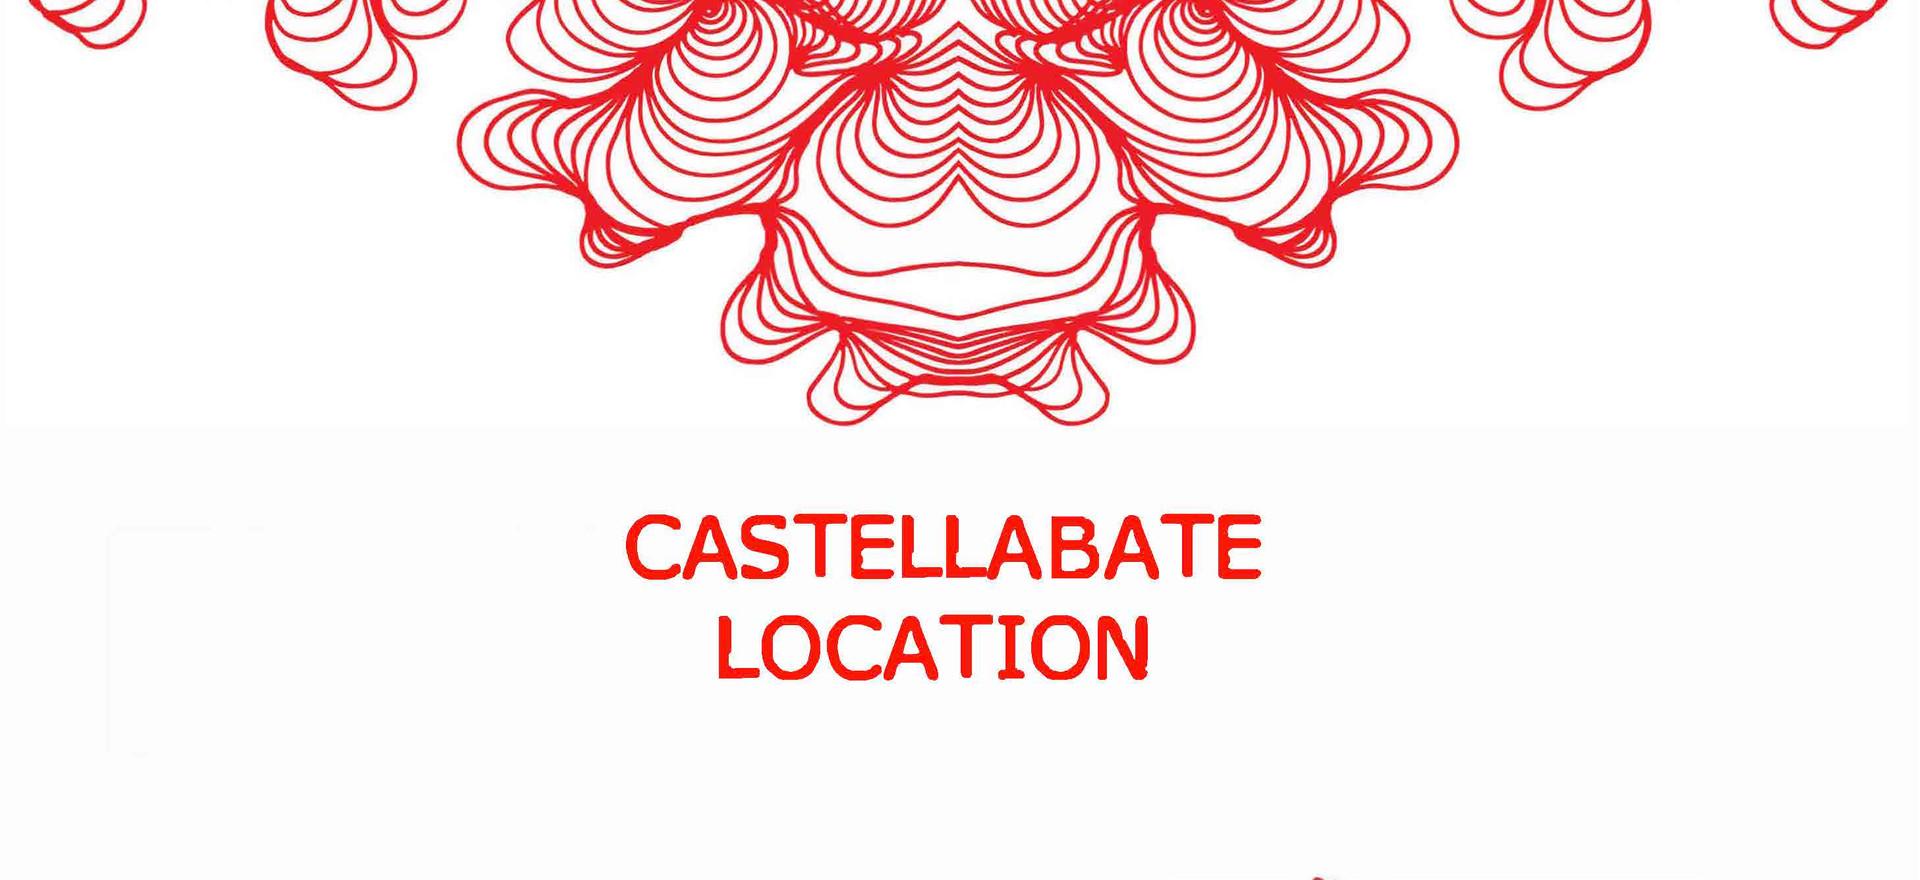 castellabate location_Pagina_1.jpg